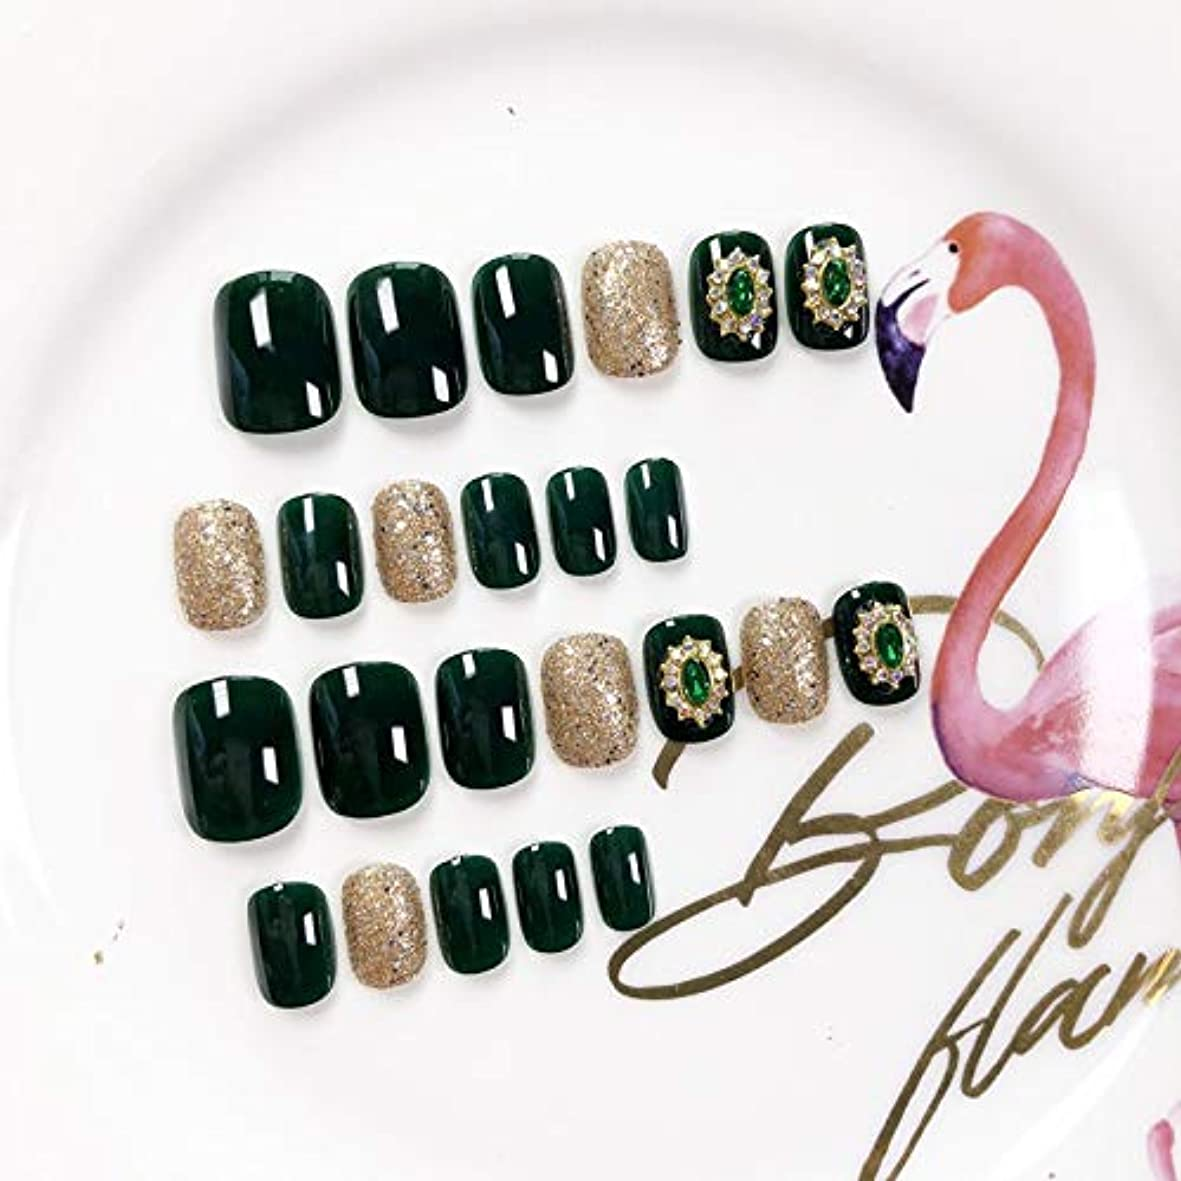 XUANHU HOME 緑色の偽爪キット24ピースダークグリーンとダイヤモンド偽爪、接着剤付きフルカバーミディアムレングス